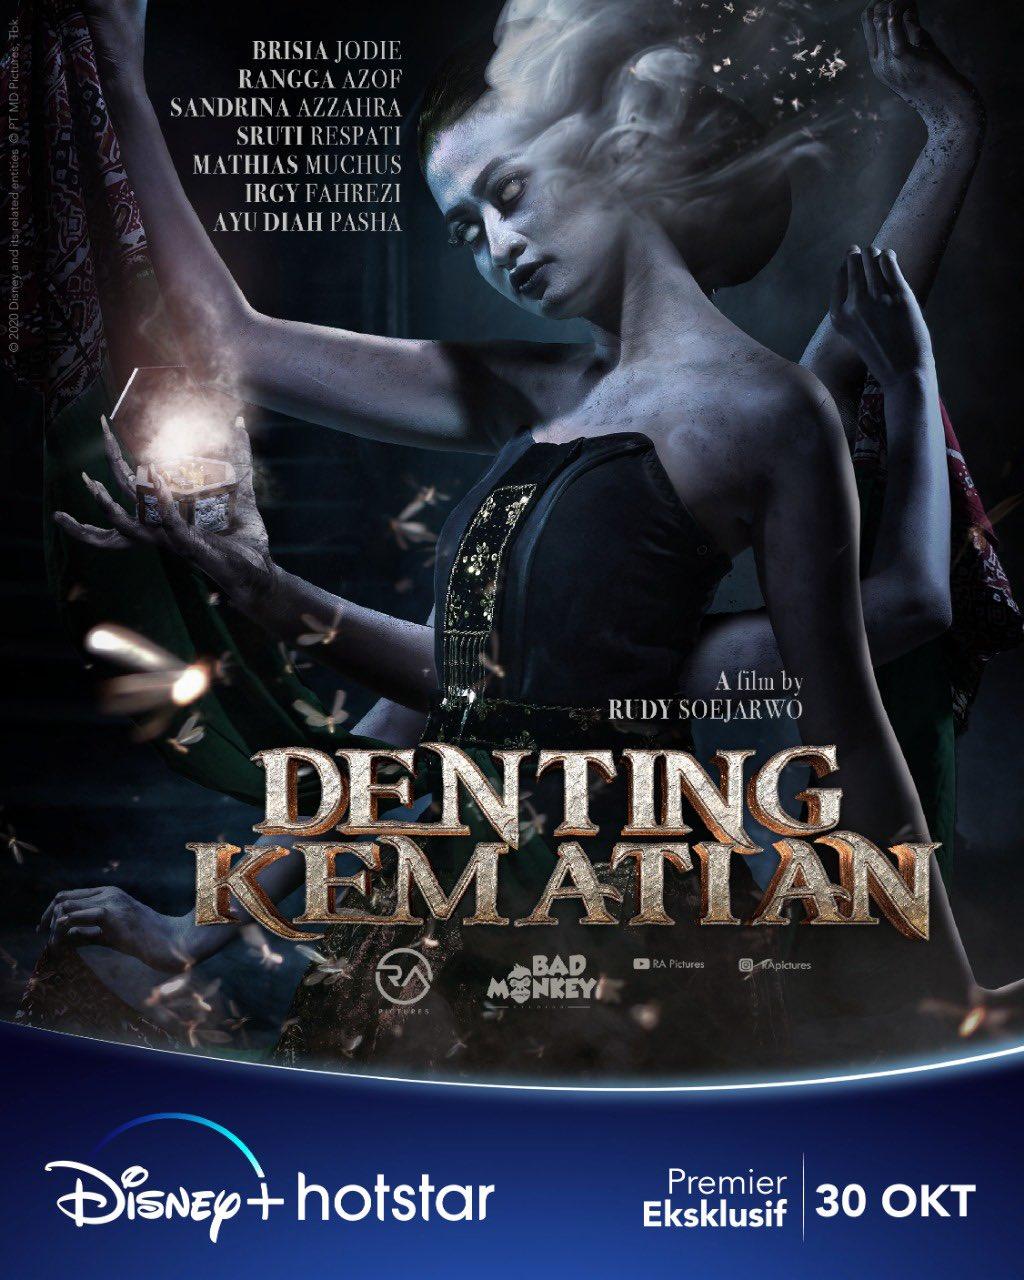 Denting Kematian 1